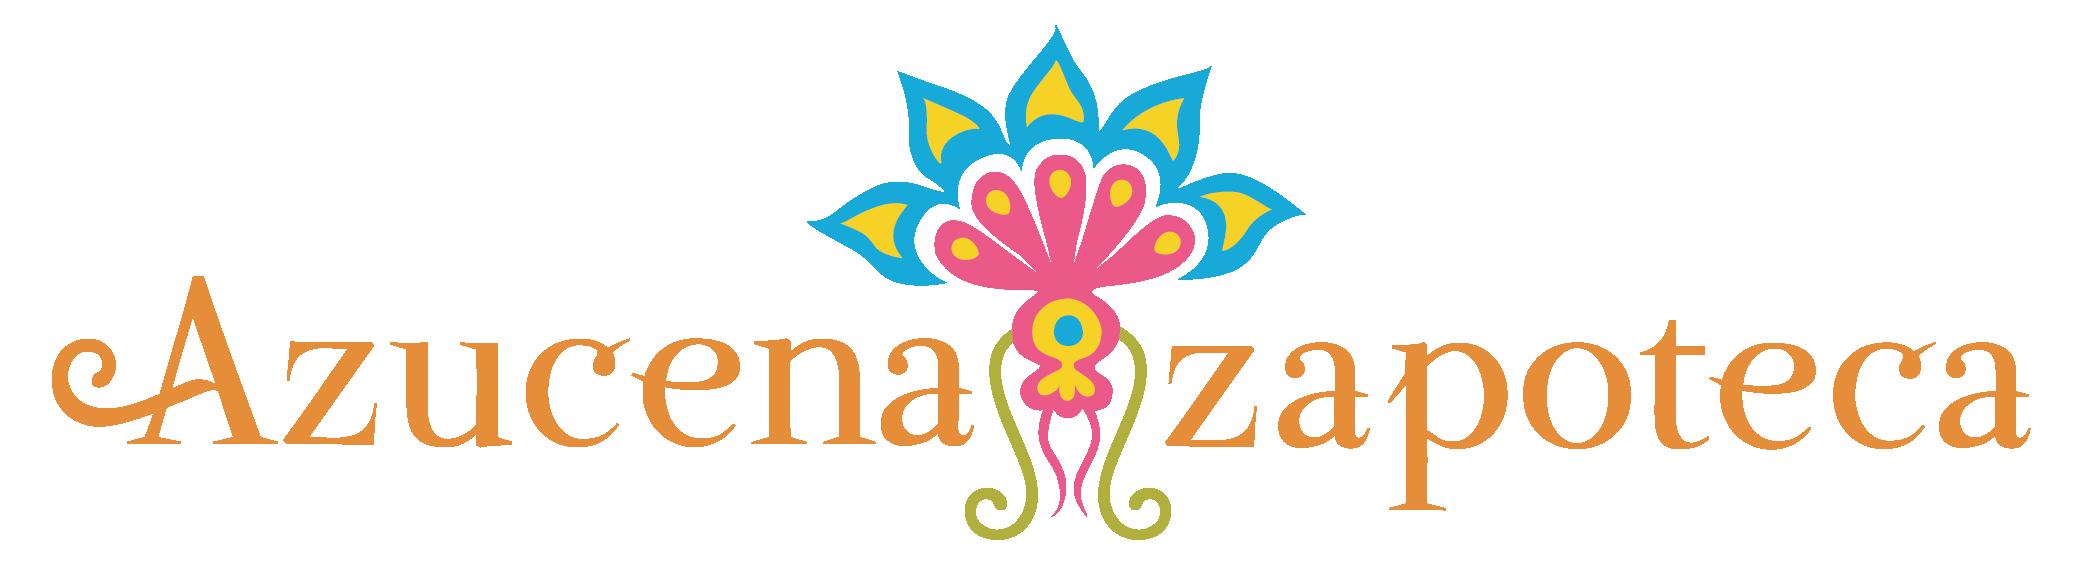 Azucena Zapoteca